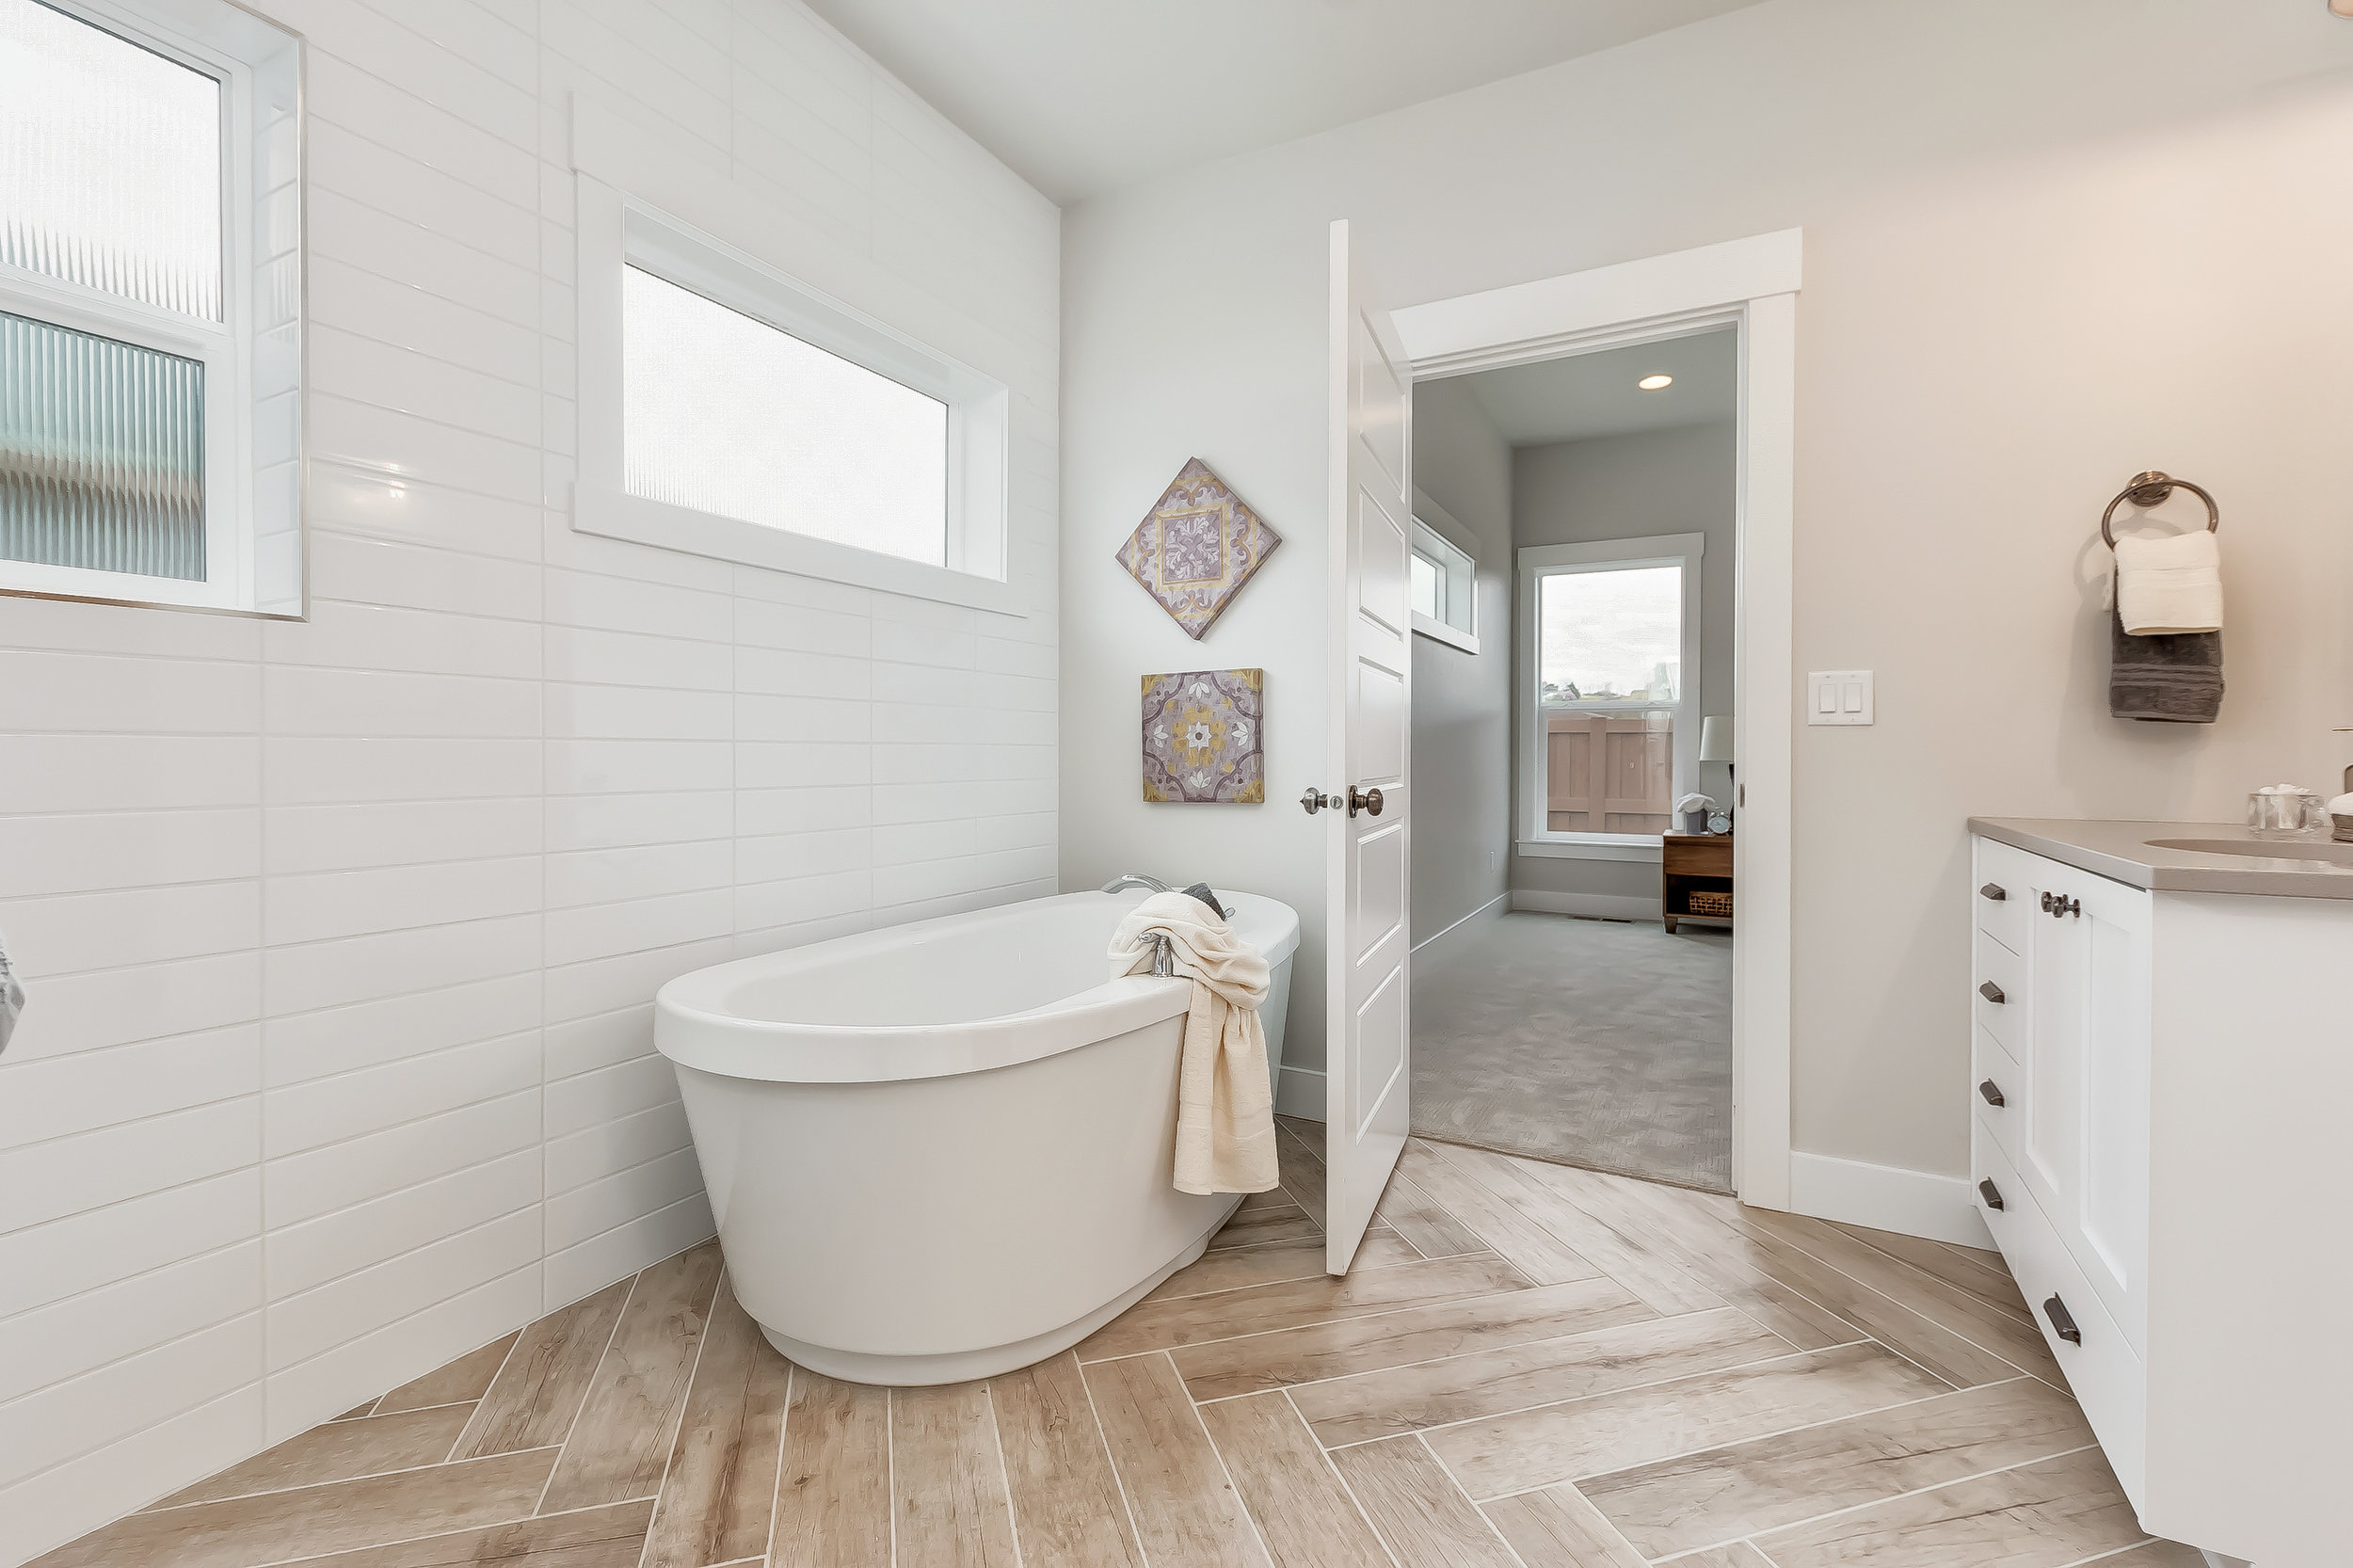 034_Master Bathroom .jpg